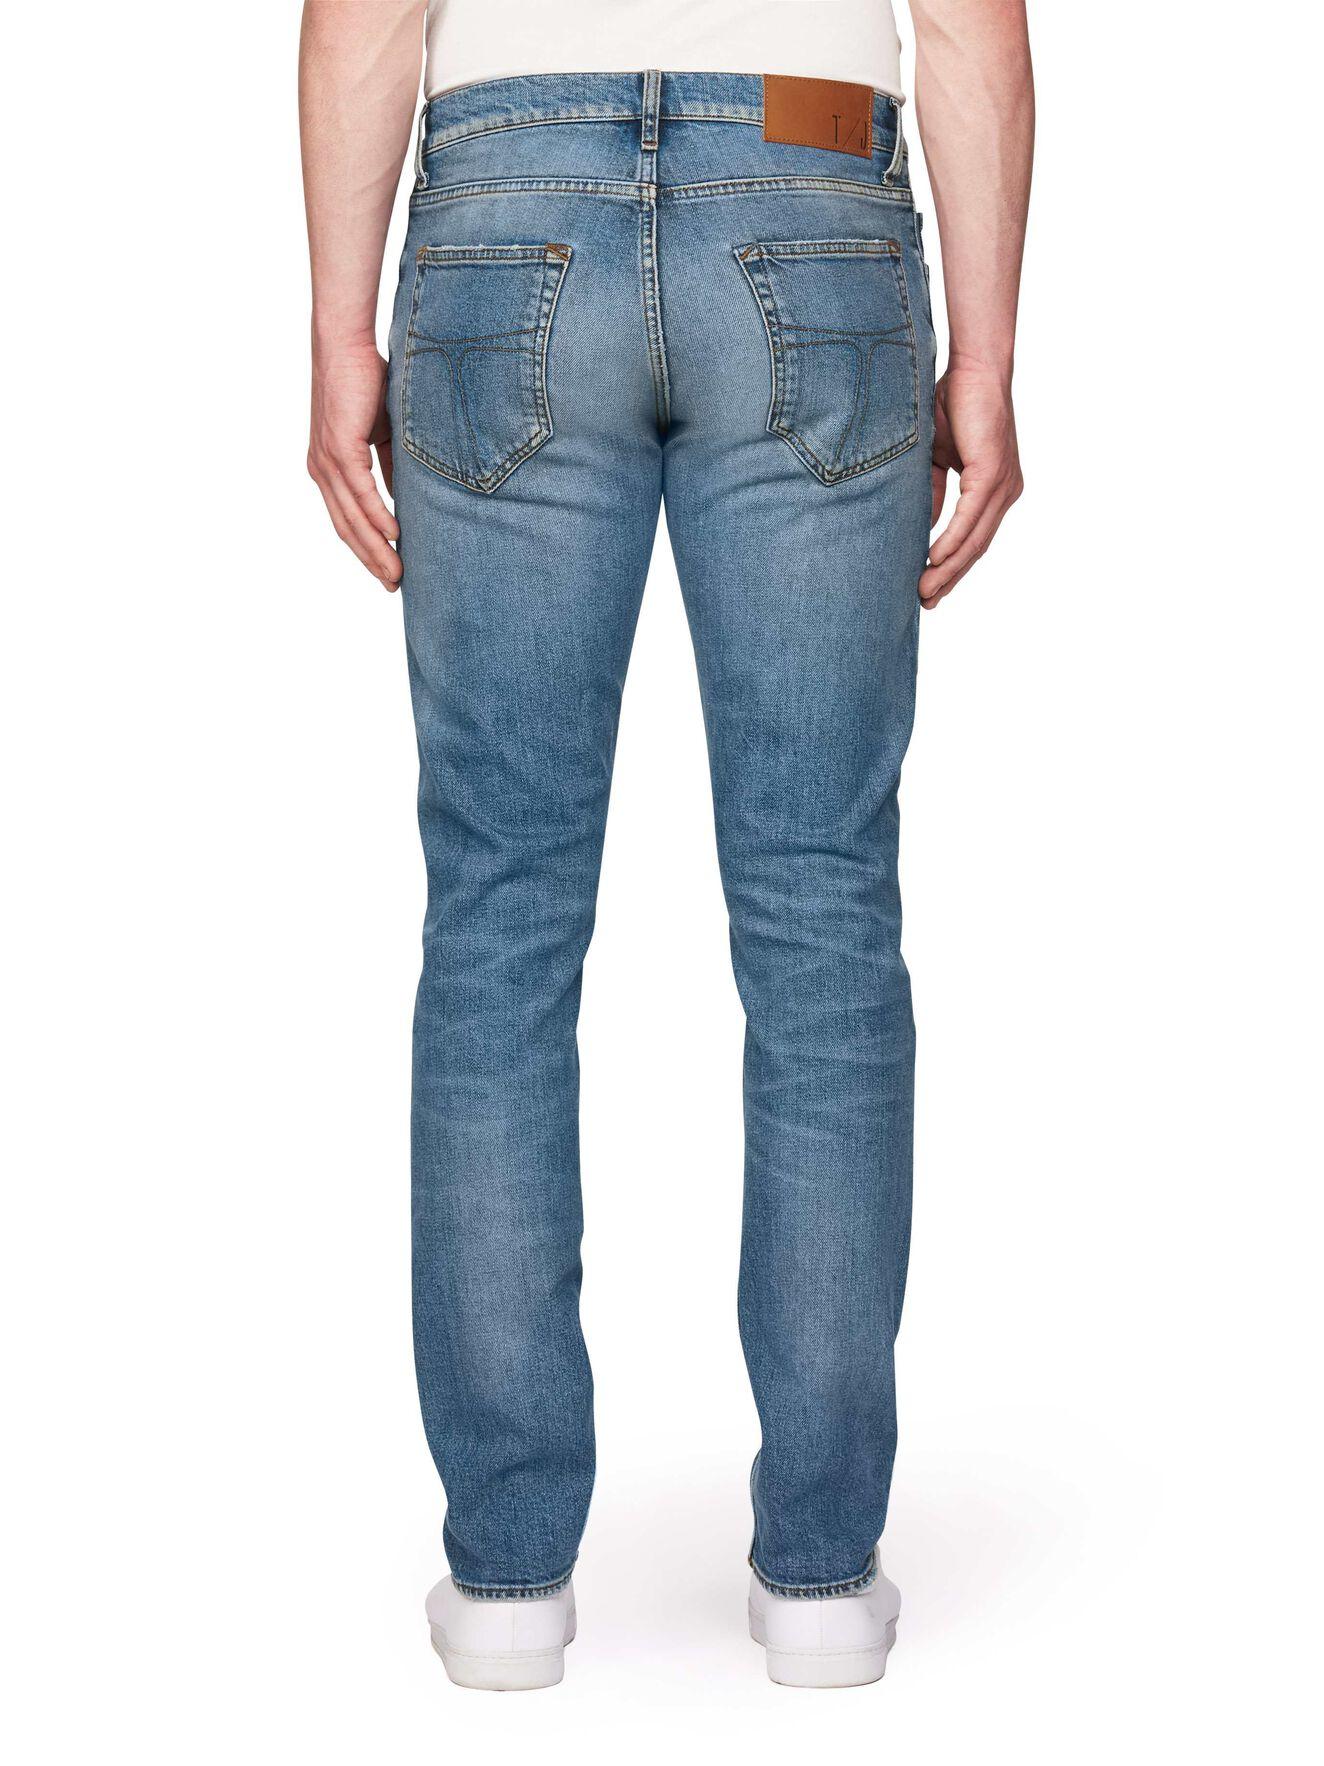 Pistolero jeans in Medium Blue from Tiger of Sweden